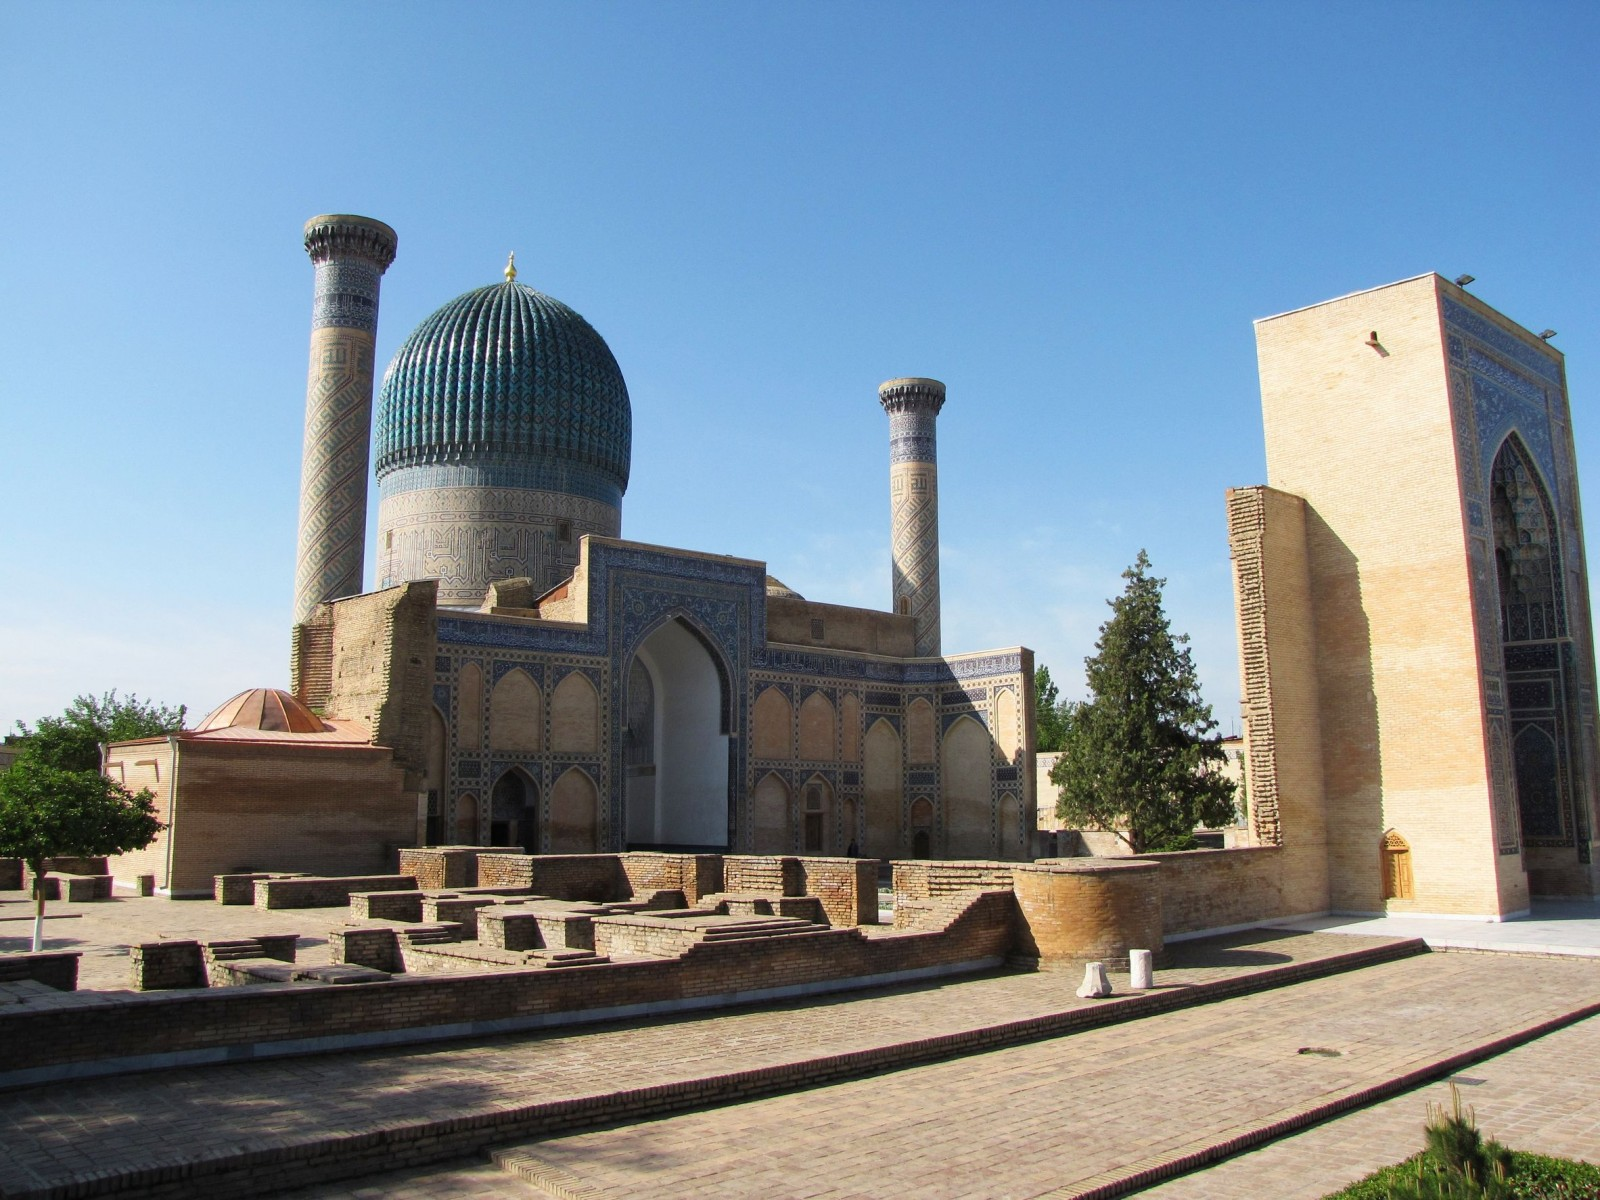 gur-e-amir-mausoleum-in-samarkand-uzbekistan-1600x1200